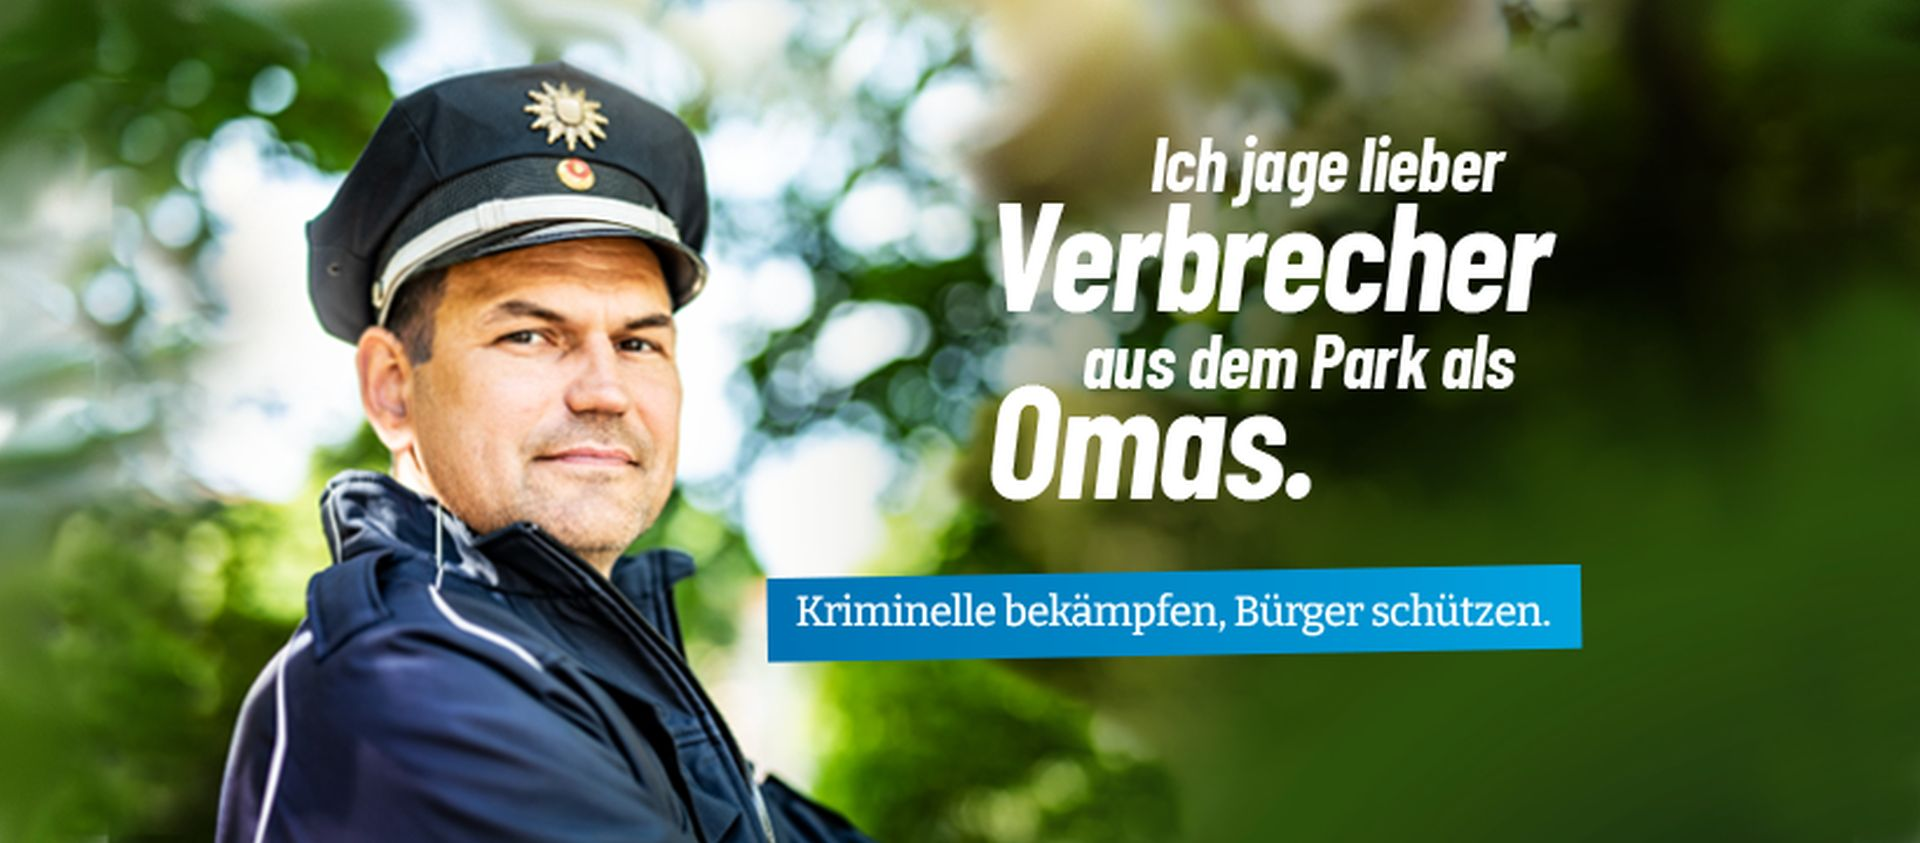 FB_Cover_Photo_Kampagne2_Polizei